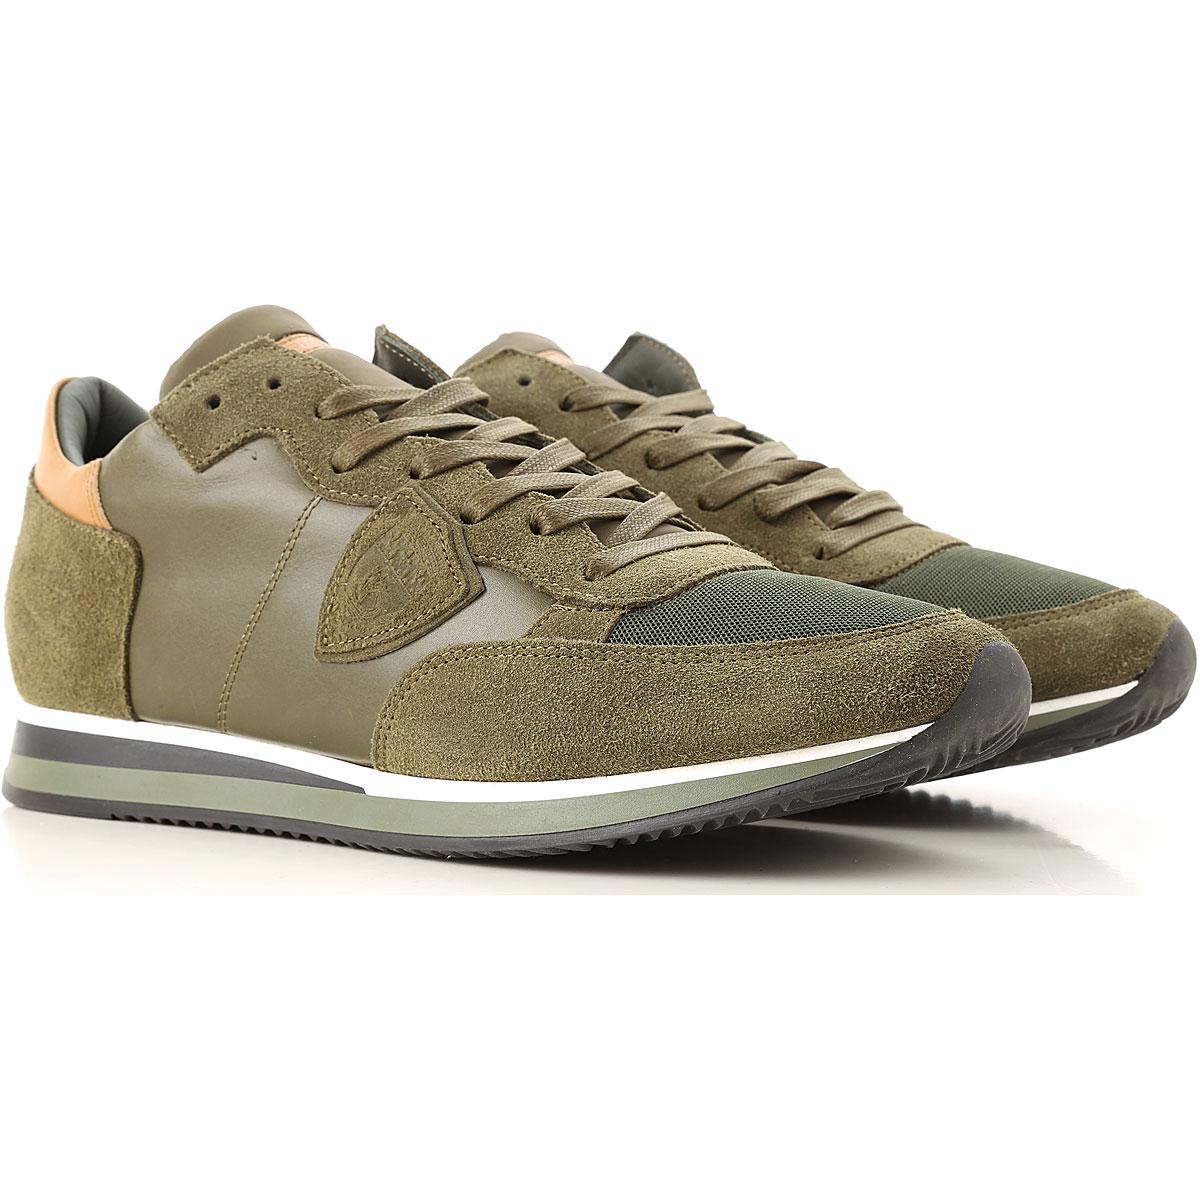 Philippe Model Sneaker Homme Pas cher en Soldes, Vert, Cuir, 2019, 39 40 42 43 44 45